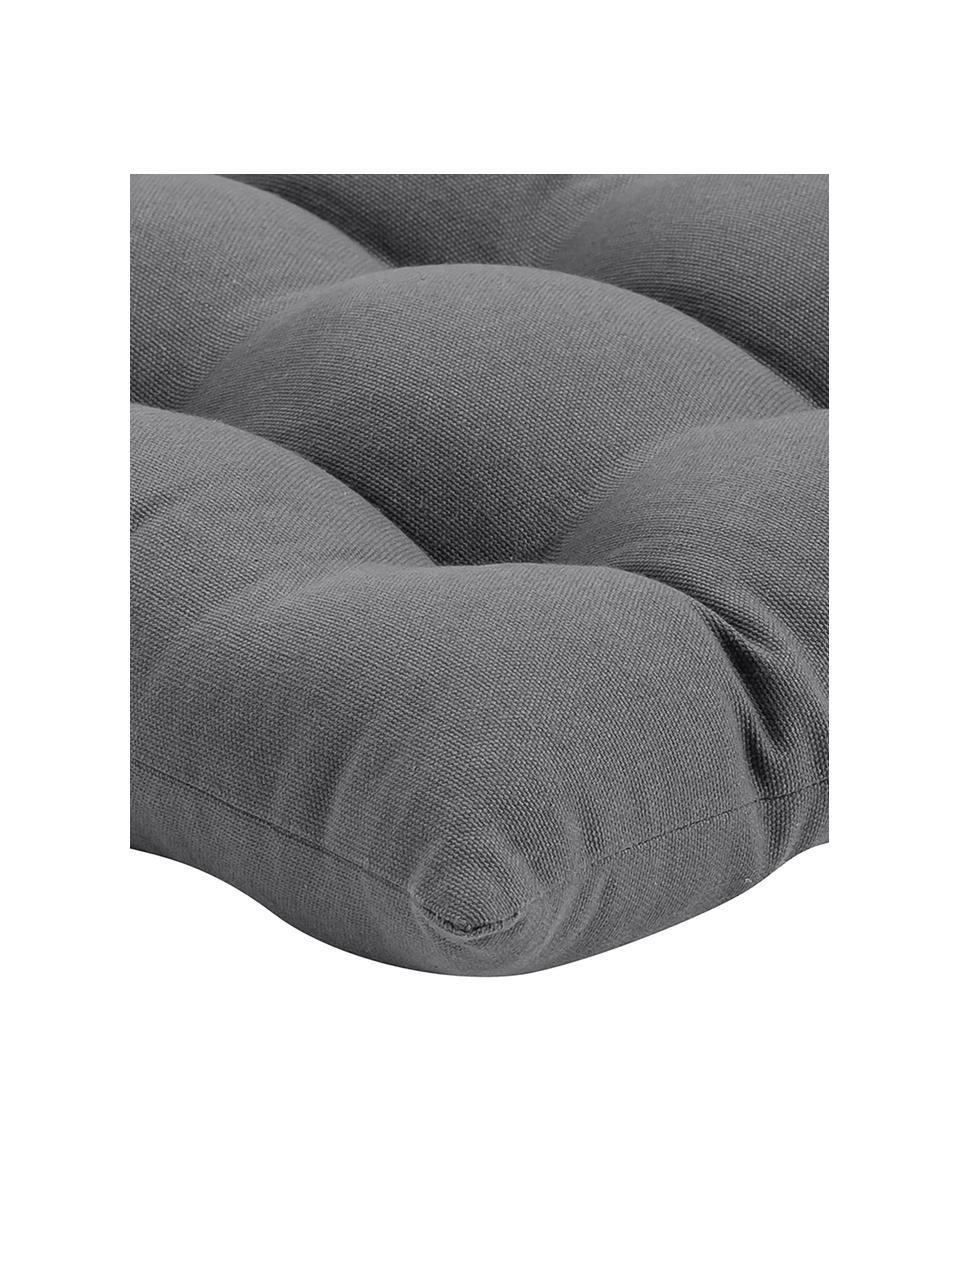 Sitzkissen Ava in Dunkelgrau, Bezug: 100% Baumwolle, Dunkelgrau, 40 x 40 cm